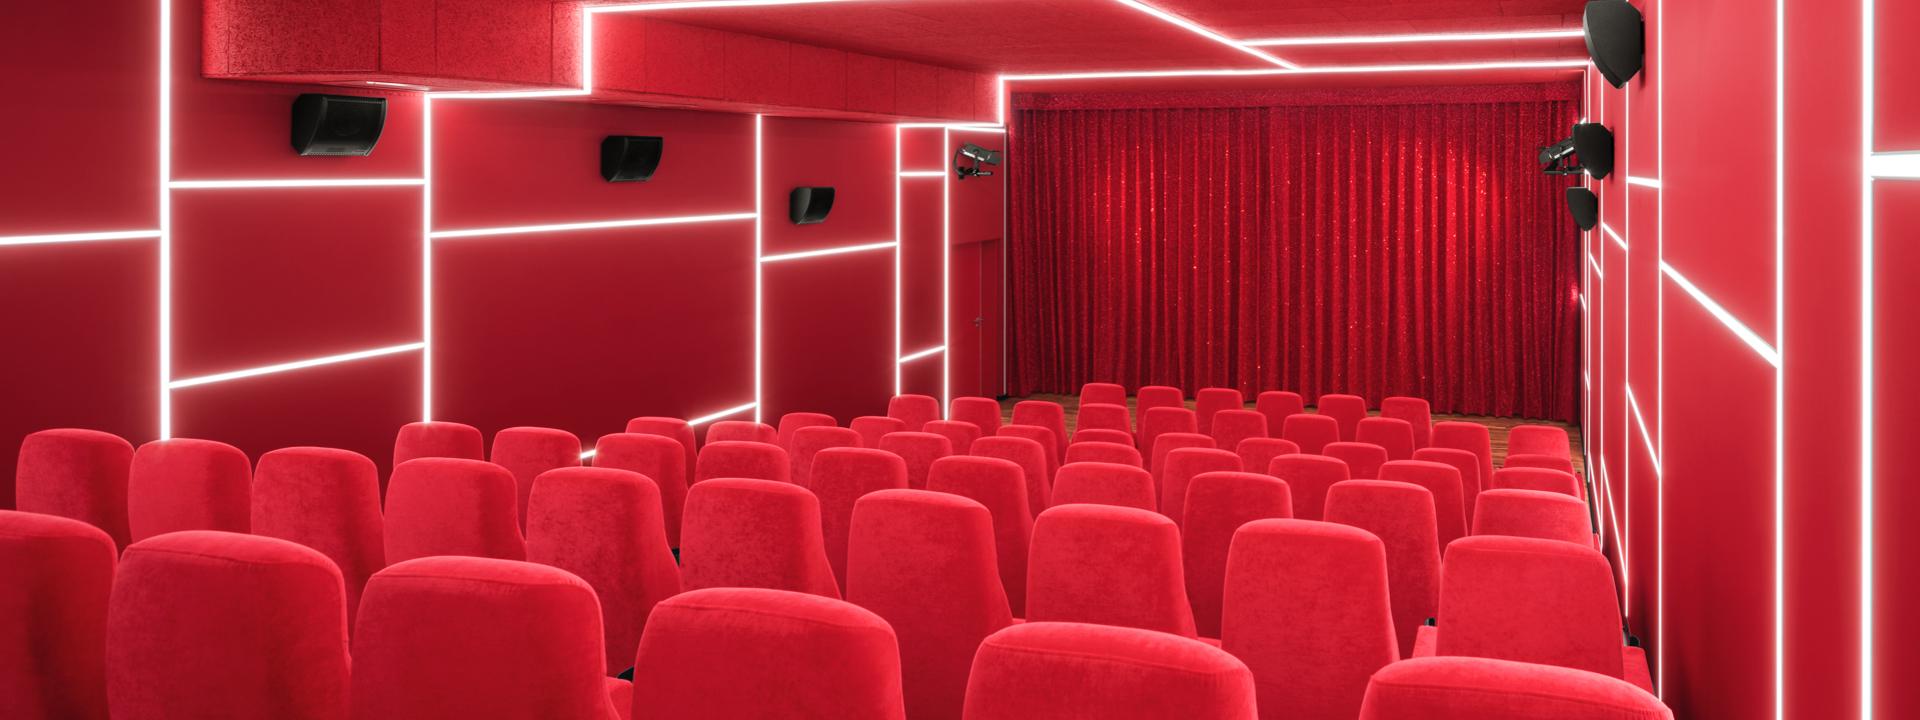 Kino Hofheim Programm Heute